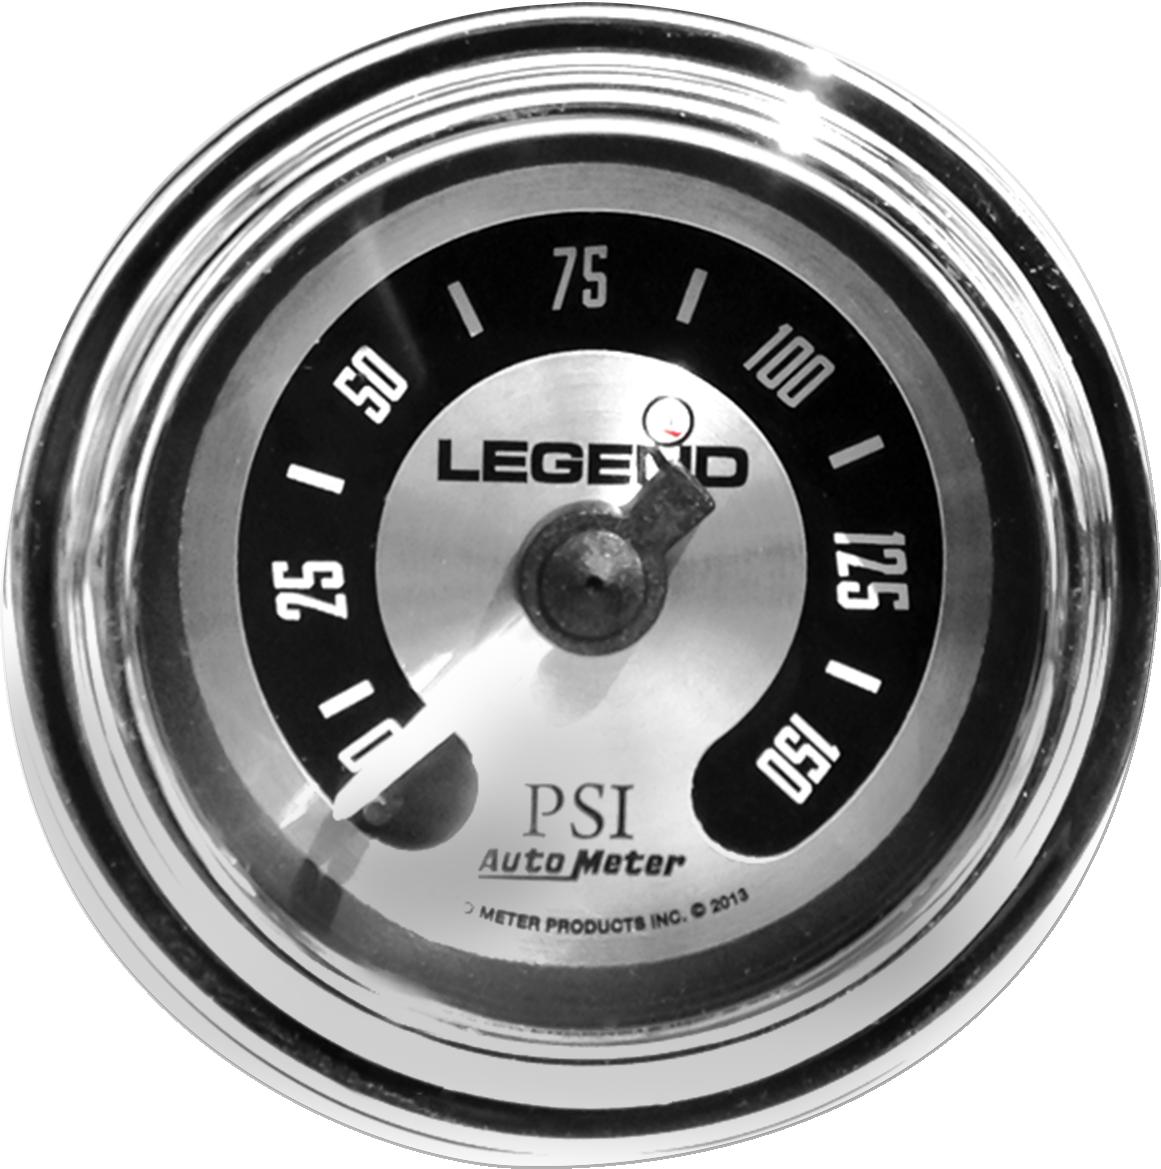 Legends chrome spun aluminum led front fairing psi air